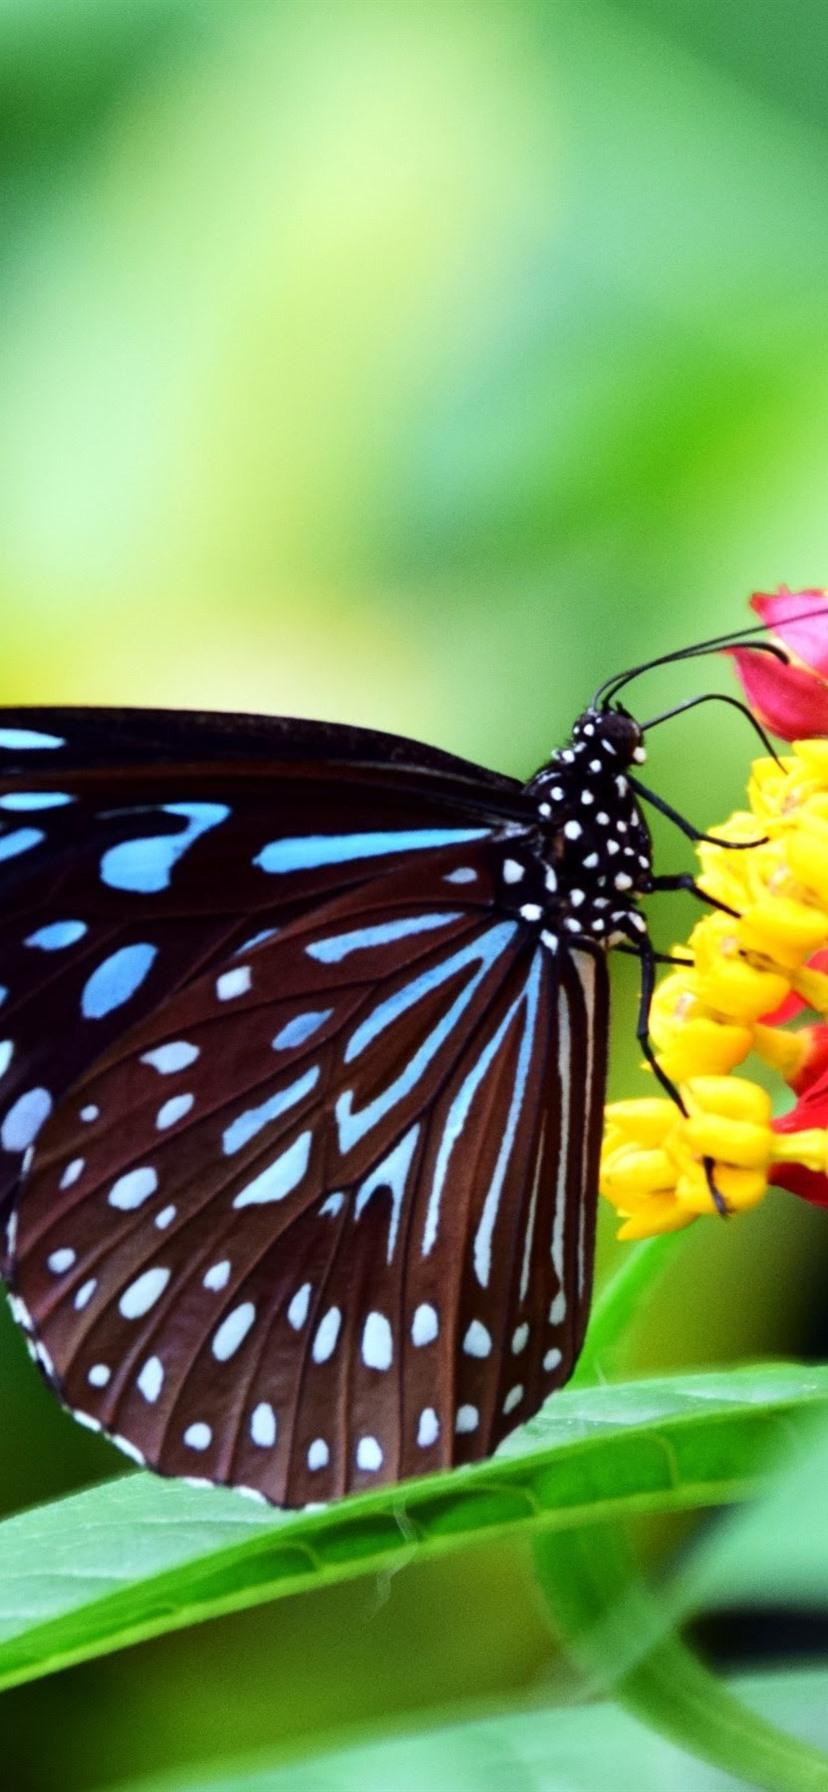 Black Wings Butterfly Flowers Green Background 828x1792